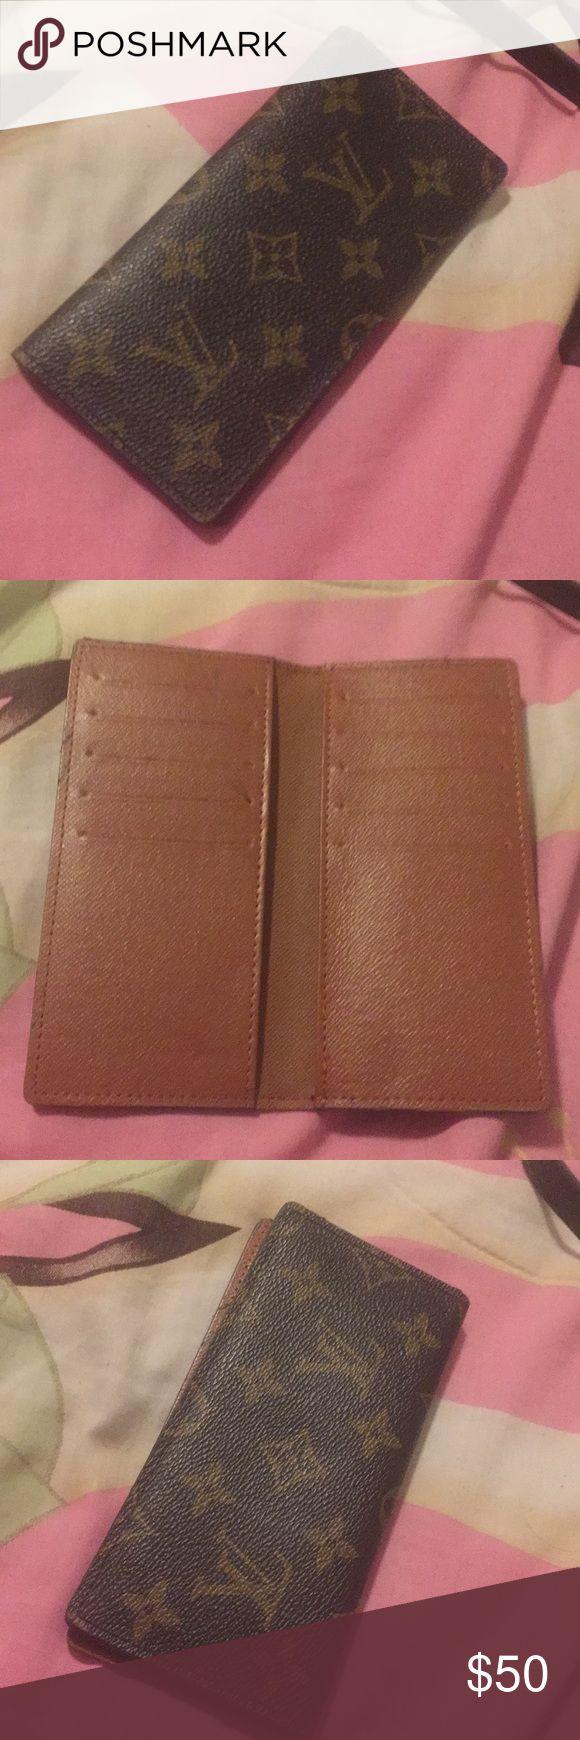 Louise Vuitton Wallet New Louis Vuitton wallet. Not Real Louis Vuitton Accessories Key & Card Holders